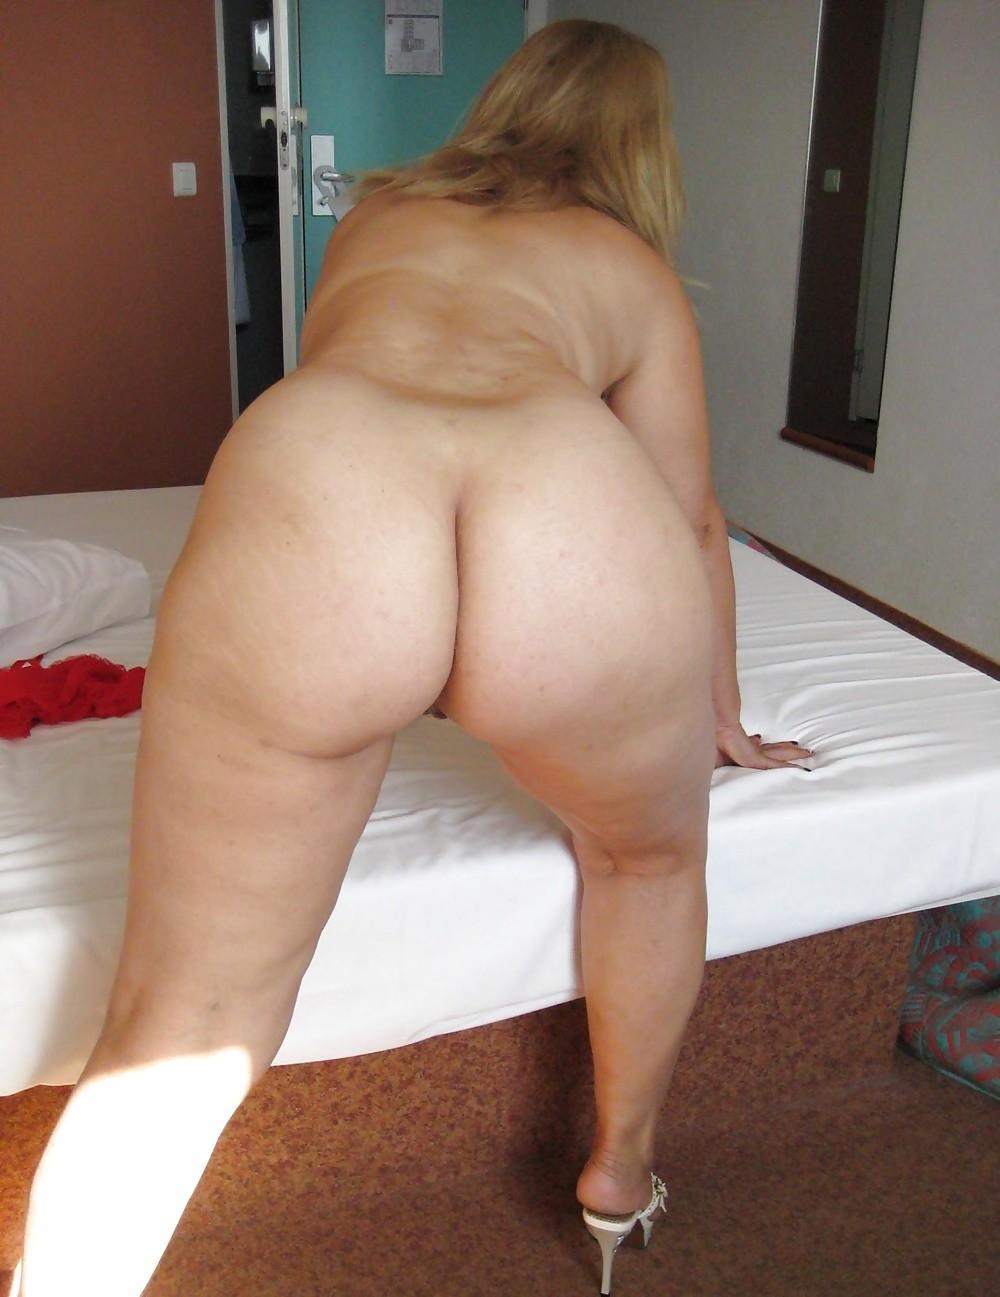 xxx free photo of nud behari women